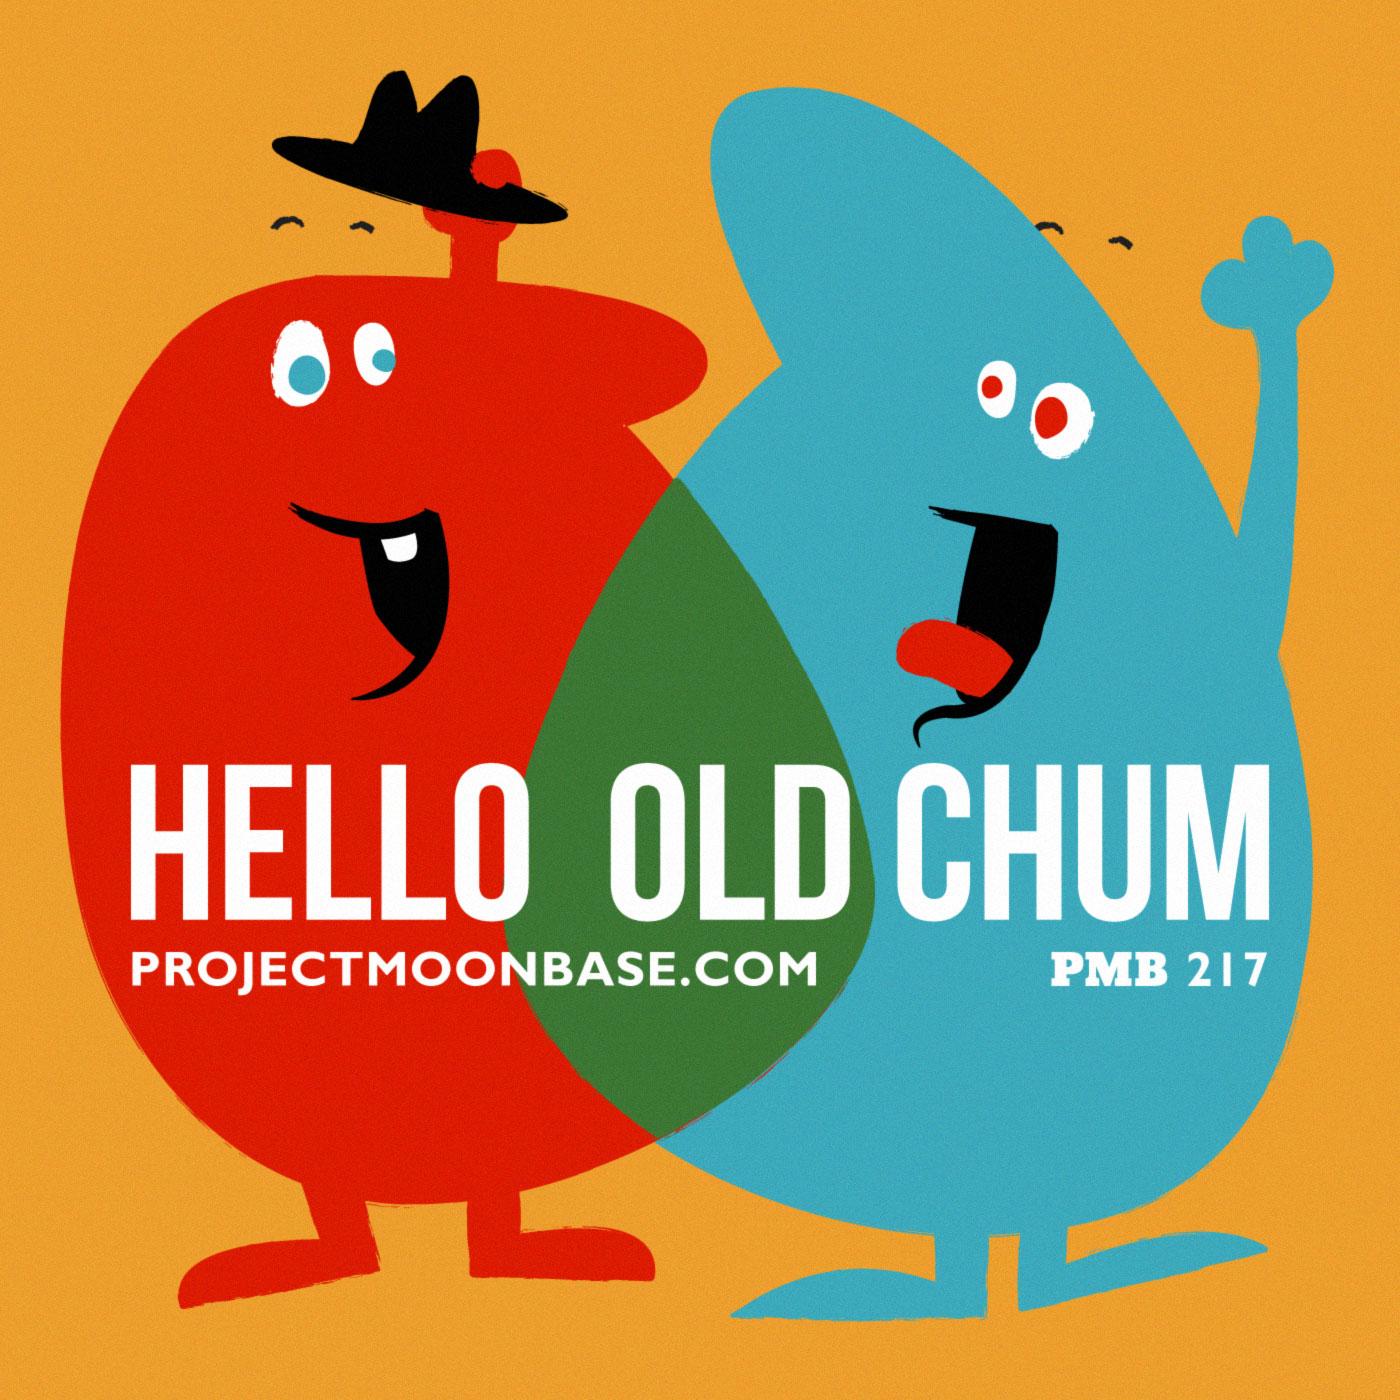 PMB217: Hello Old Chum